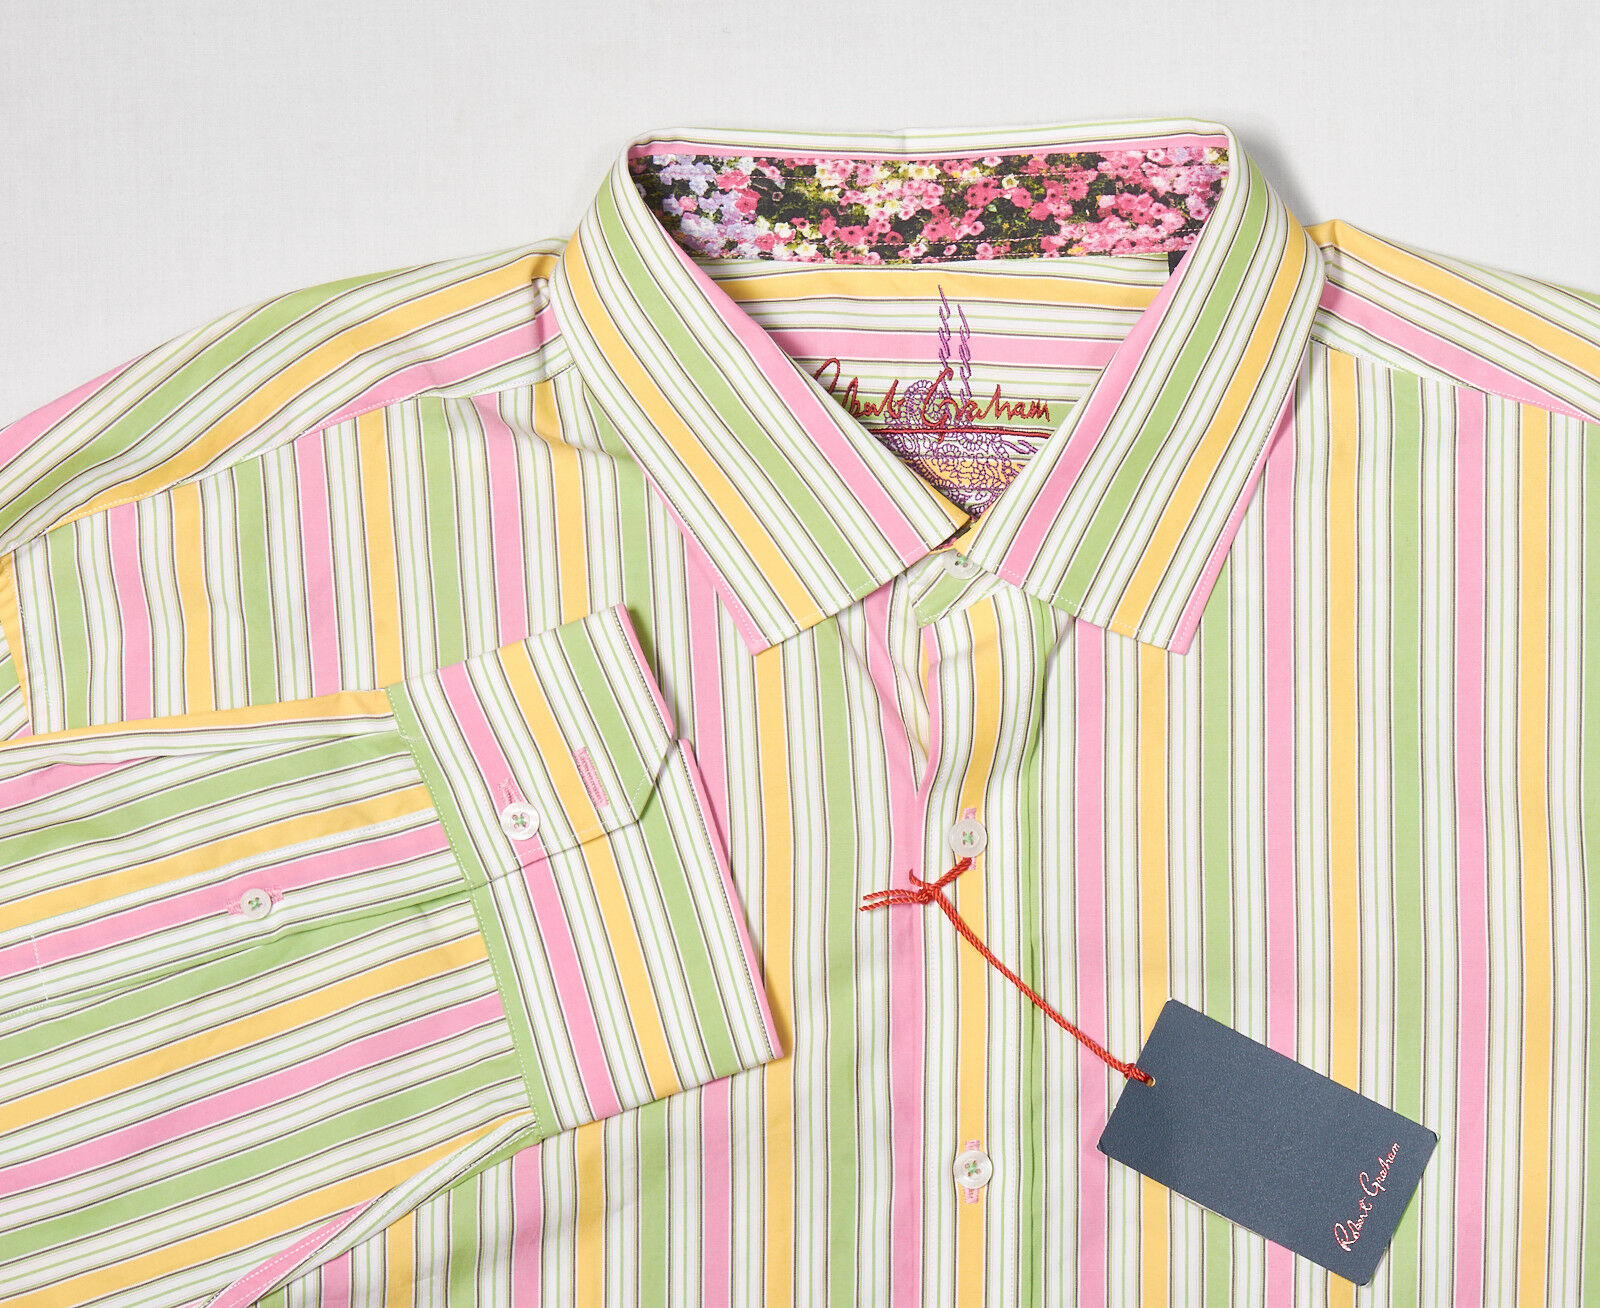 NWT Mens ROBERT GRAHAM Shirt 3XL in Lime Green Pink Yellow Striped Cotton